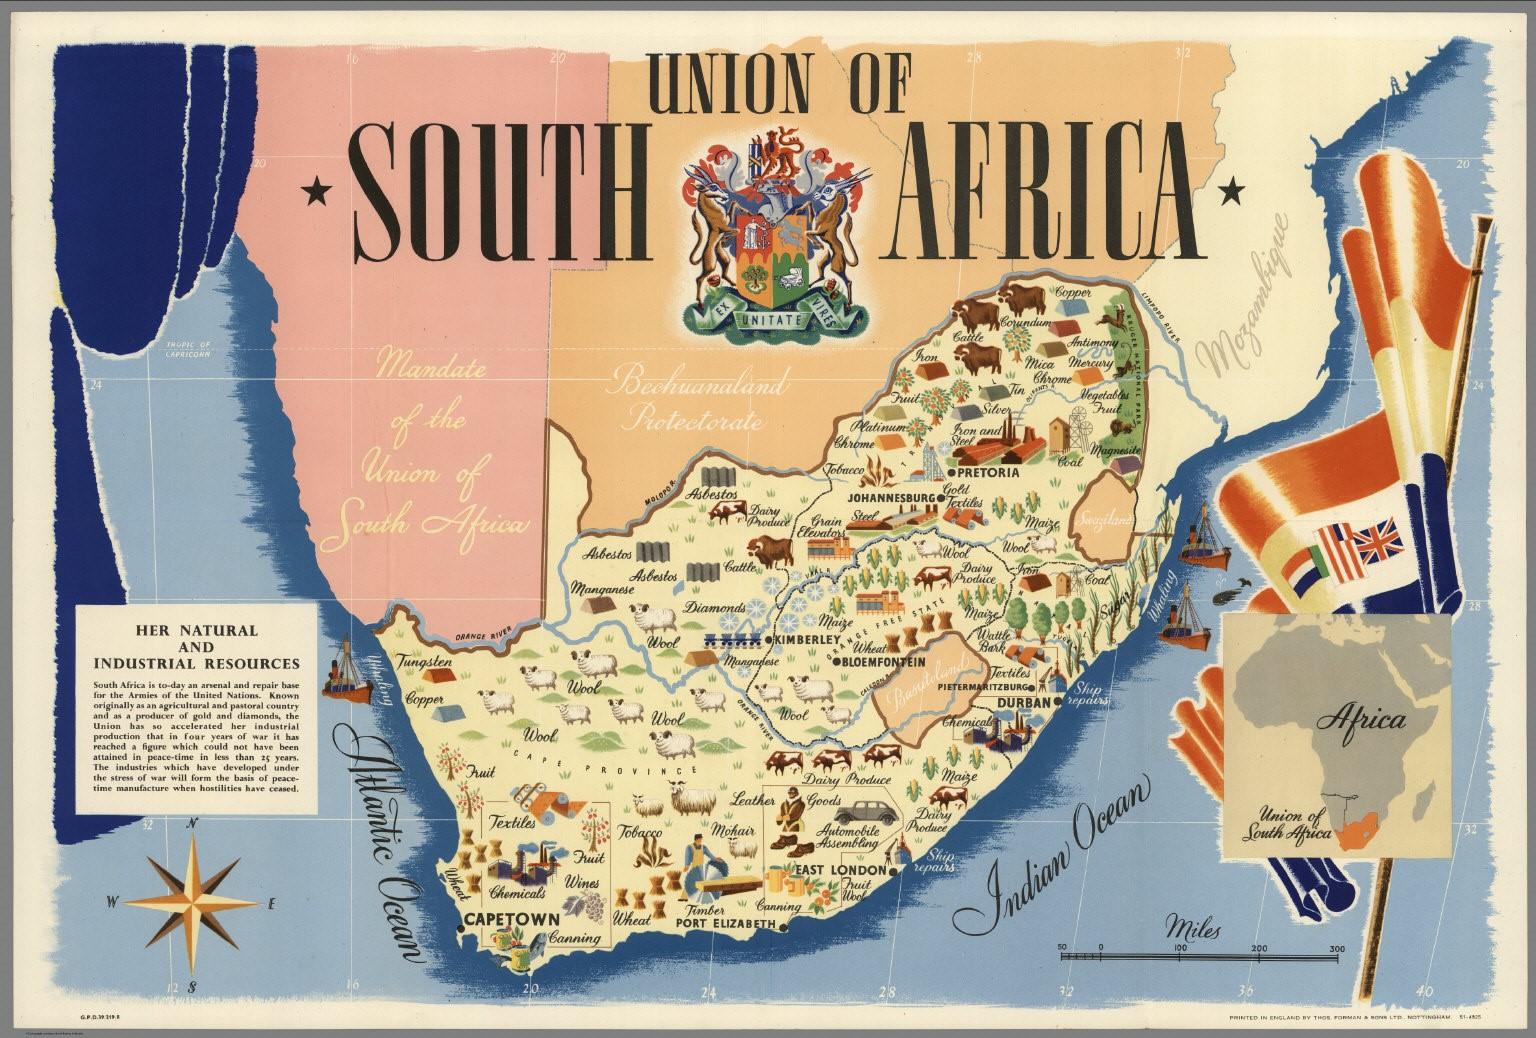 Founding Origins of South Africa